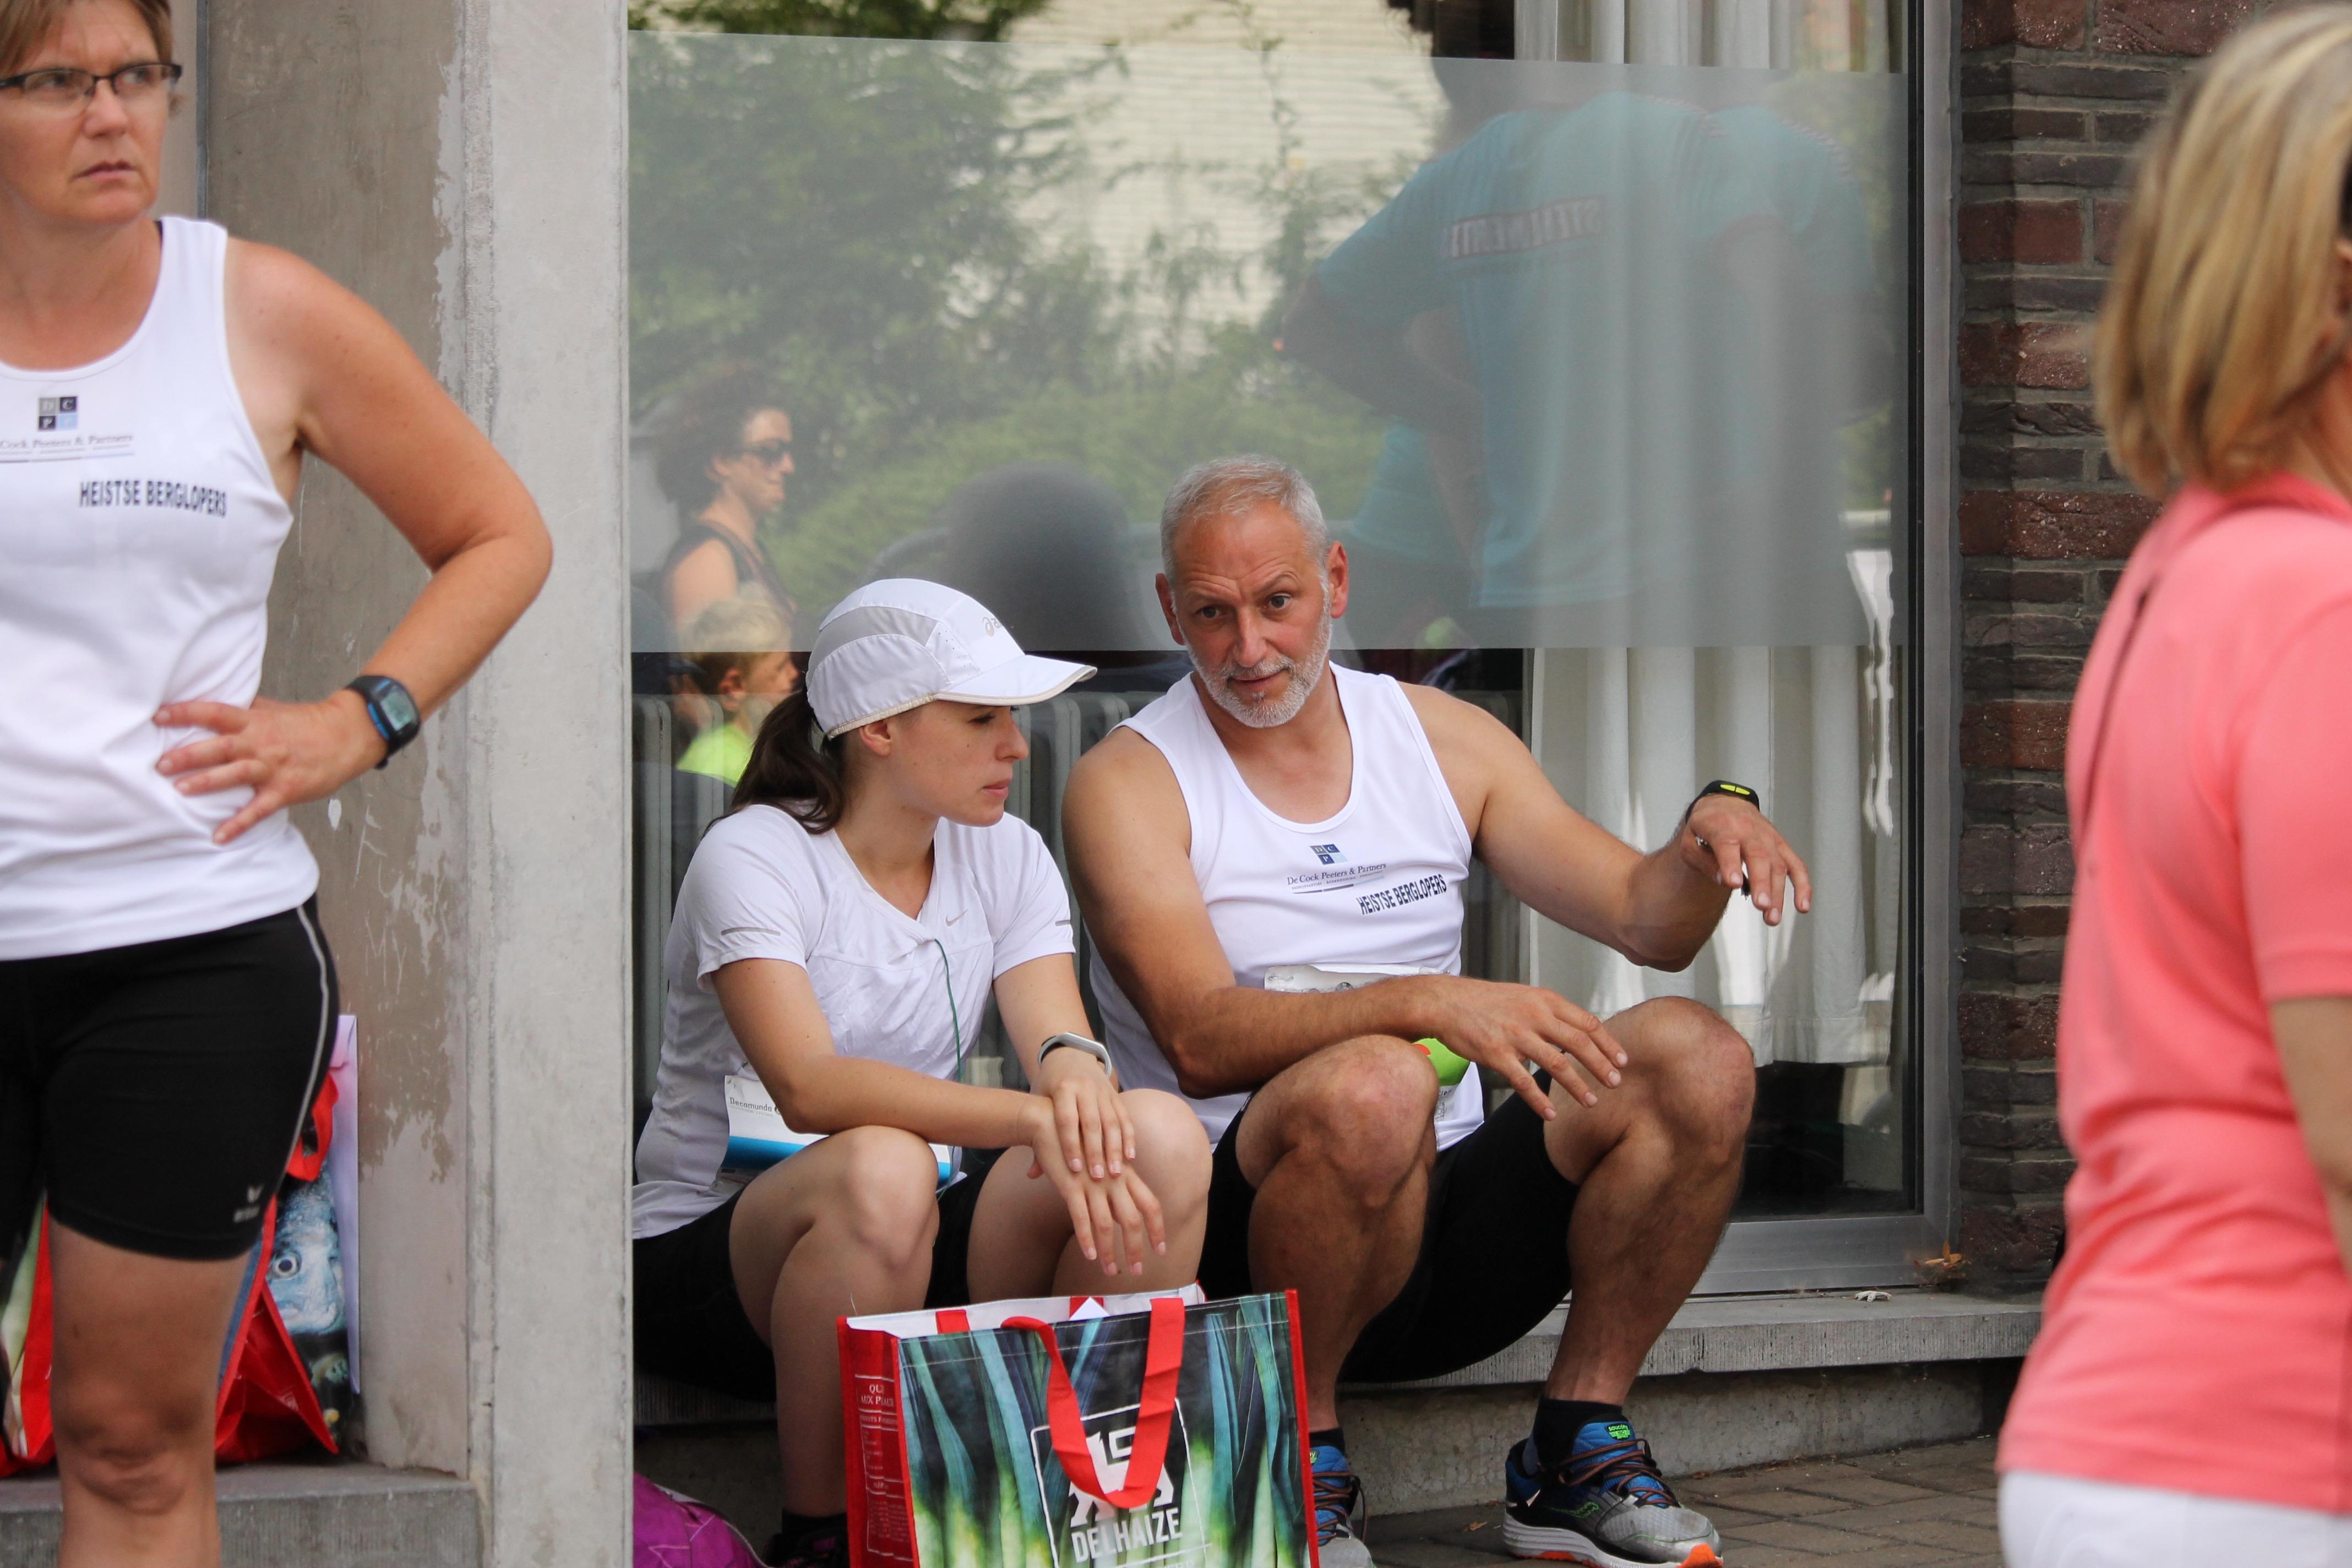 Heist Loopt 2016 5 & 10km